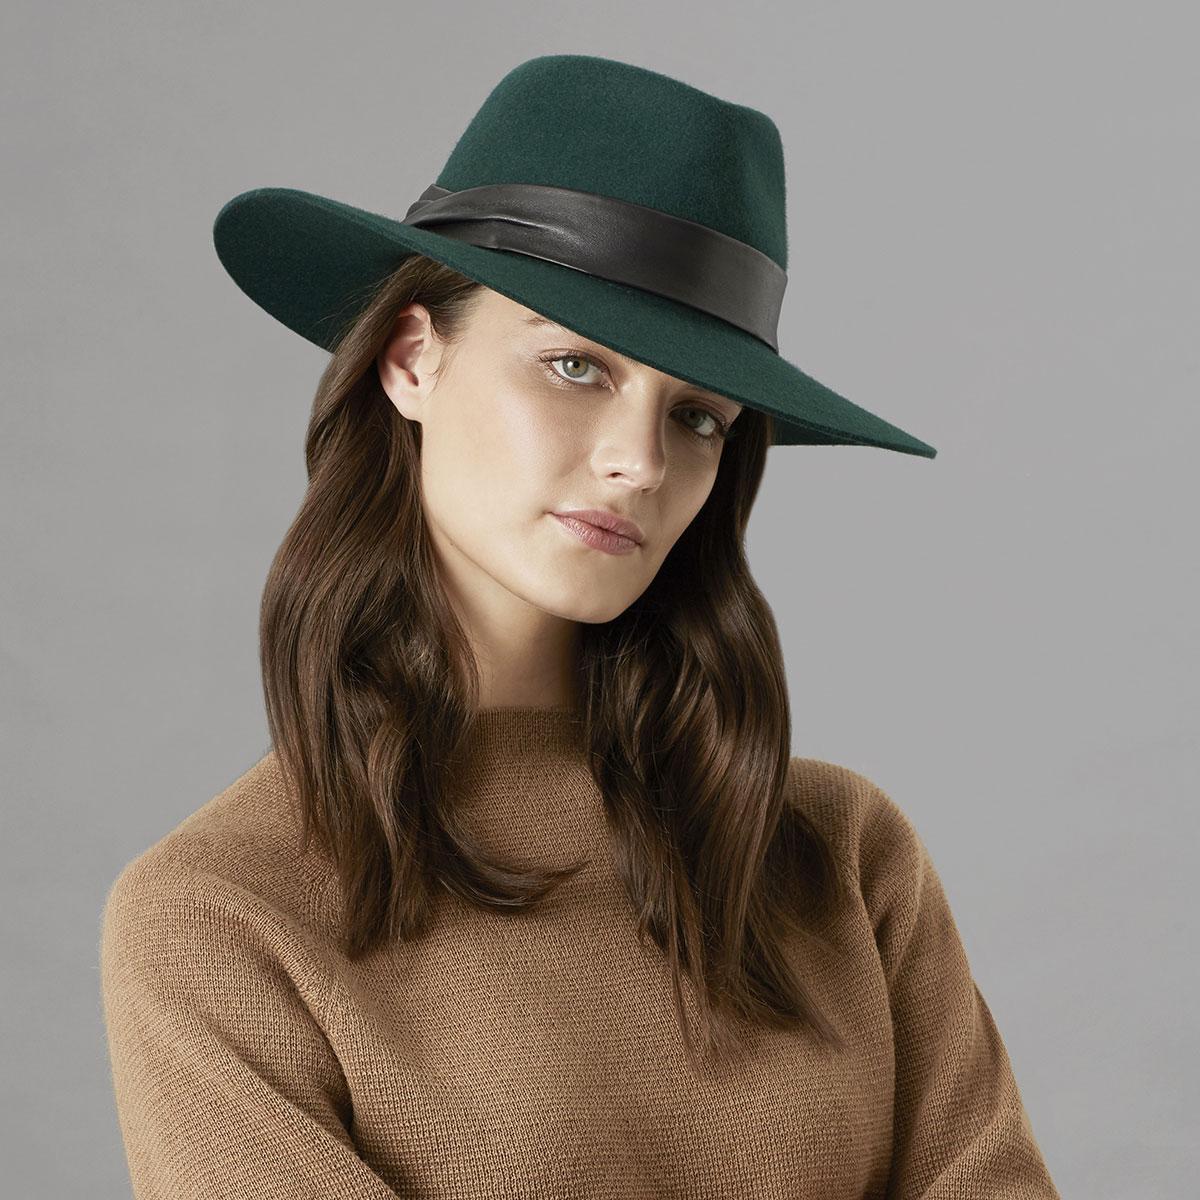 Vintage Western Wear Clothing, Outfit Ideas Carie Fedora - Emerald1SFM $150.00 AT vintagedancer.com